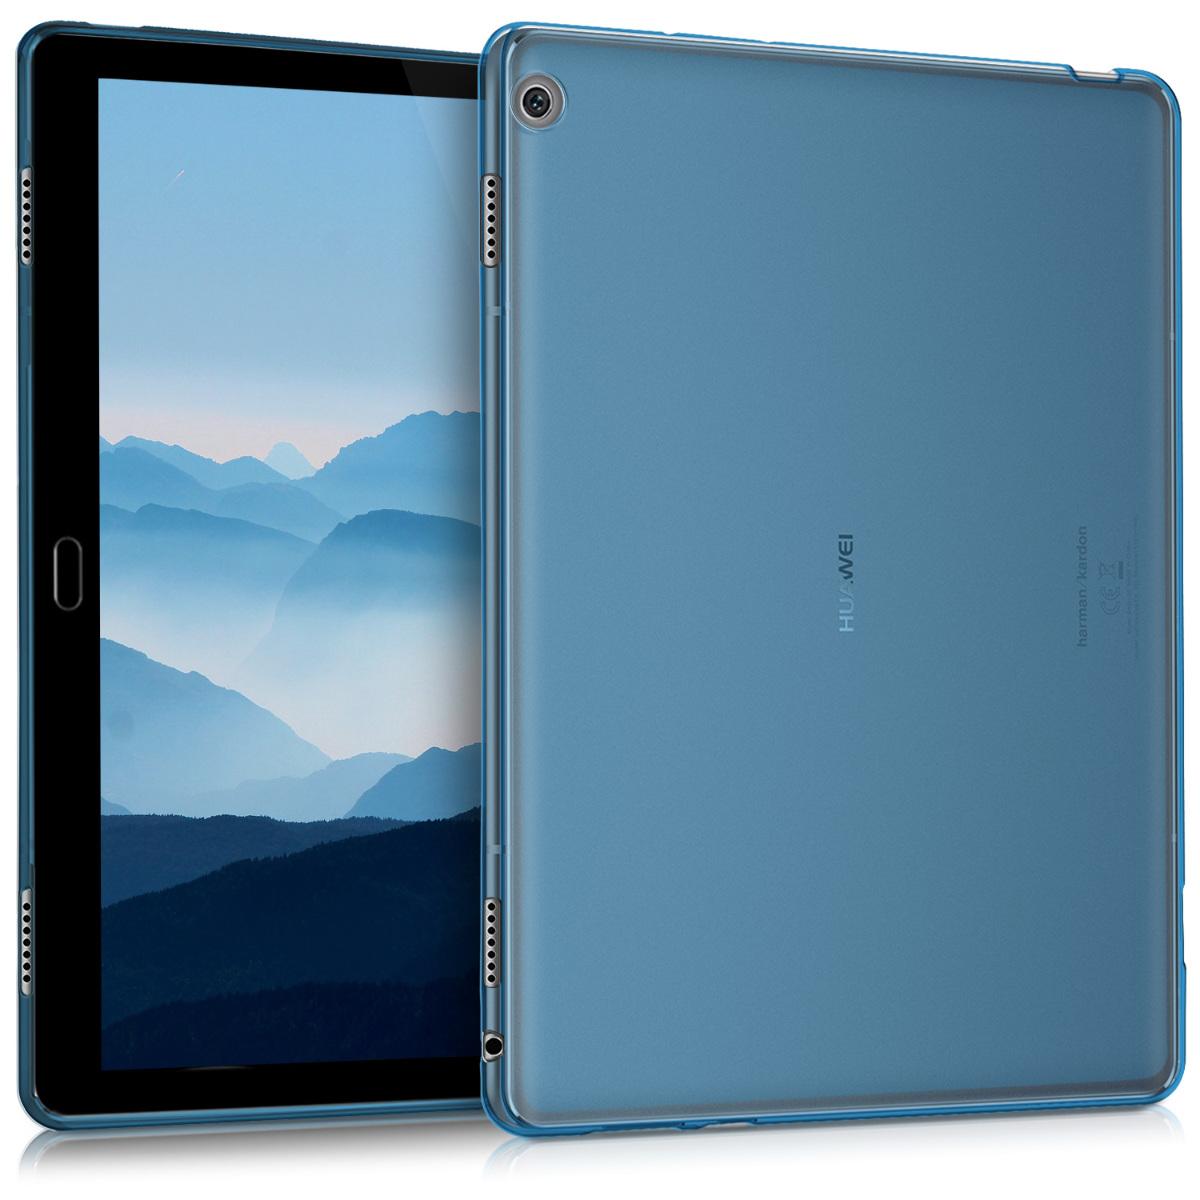 KW Θήκη Σιλικόνη Huawei MediaPad M3 Lite 10 - Blue (41992.04)